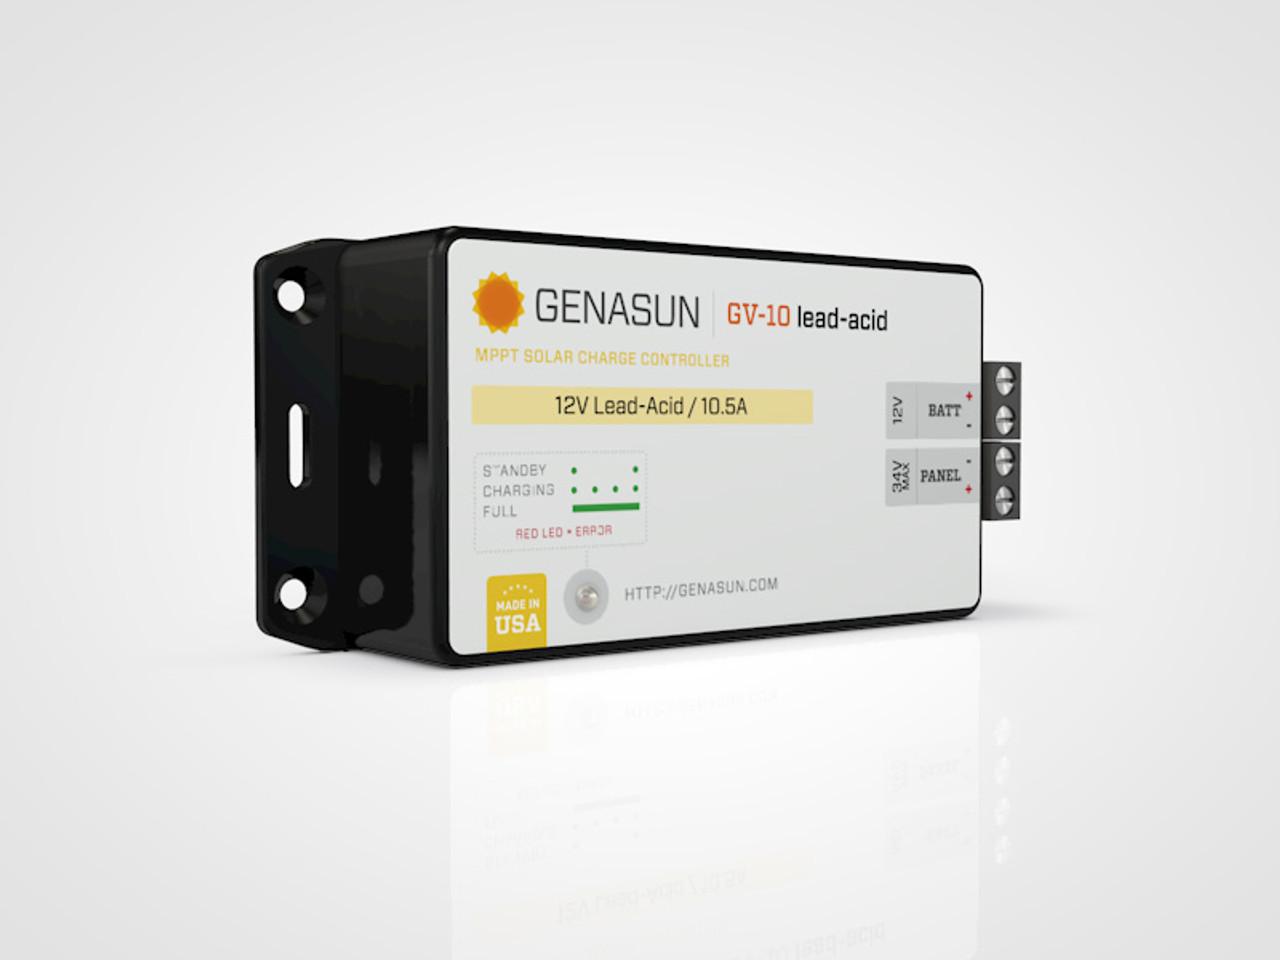 GV-10 | 140W 10.5A Genasun MPPT Solar Charge Controller - Pb - Left2